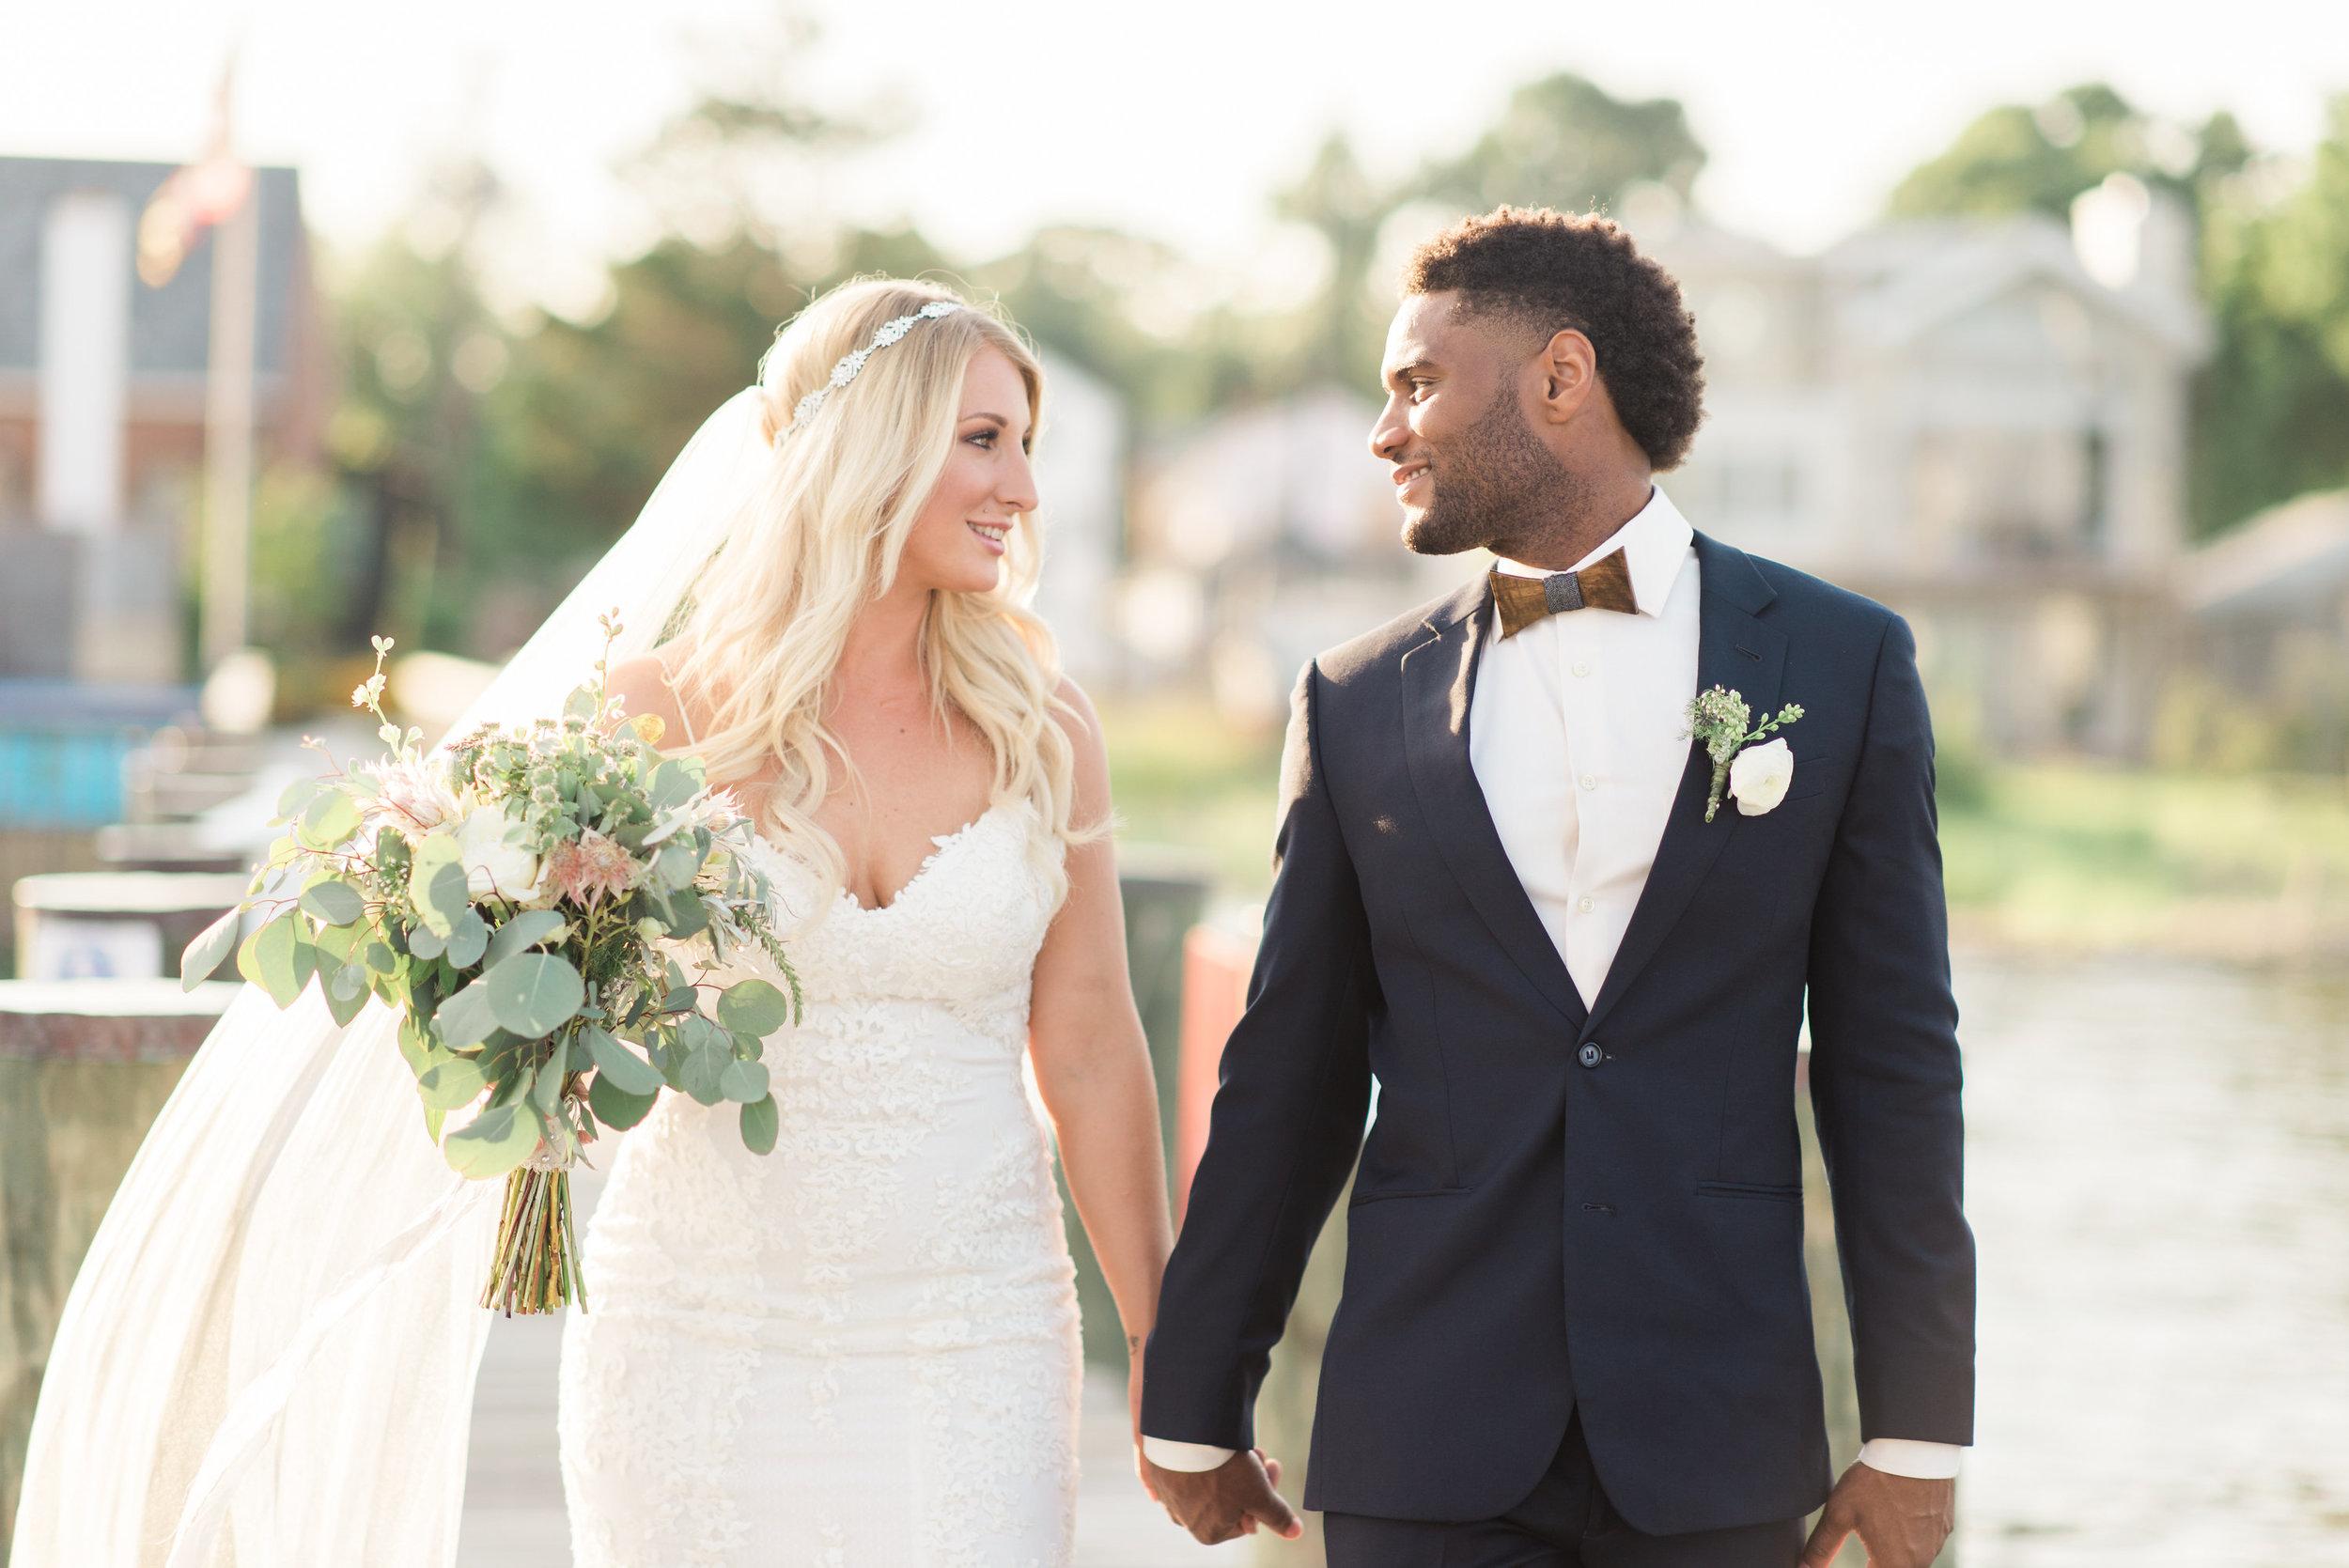 joy-michelle-photography-styled-wedding(111of204).jpg